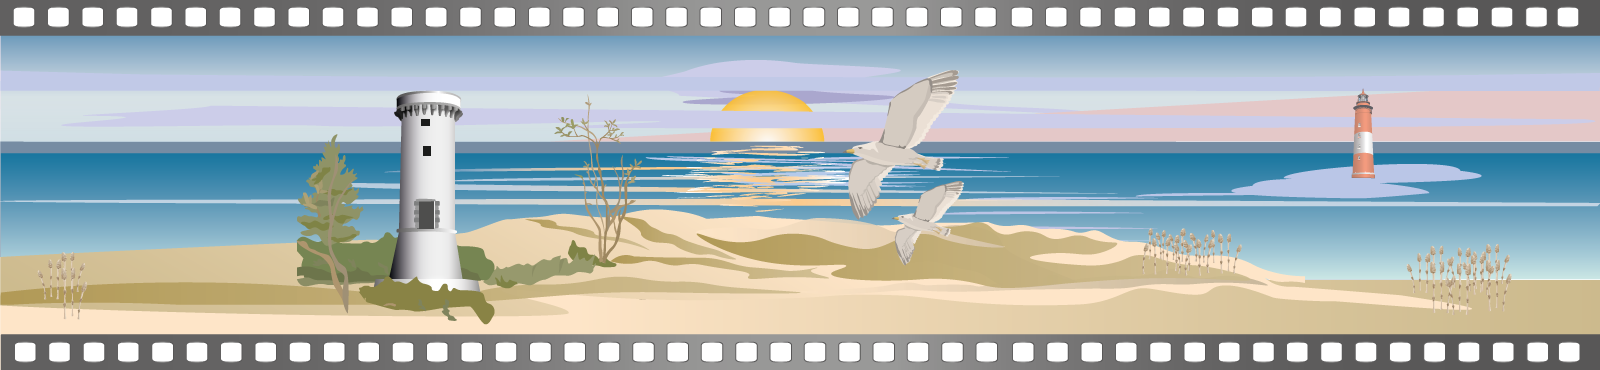 banniere-Film-plage-phare-tour-cinema-damgan-1008x370pxl